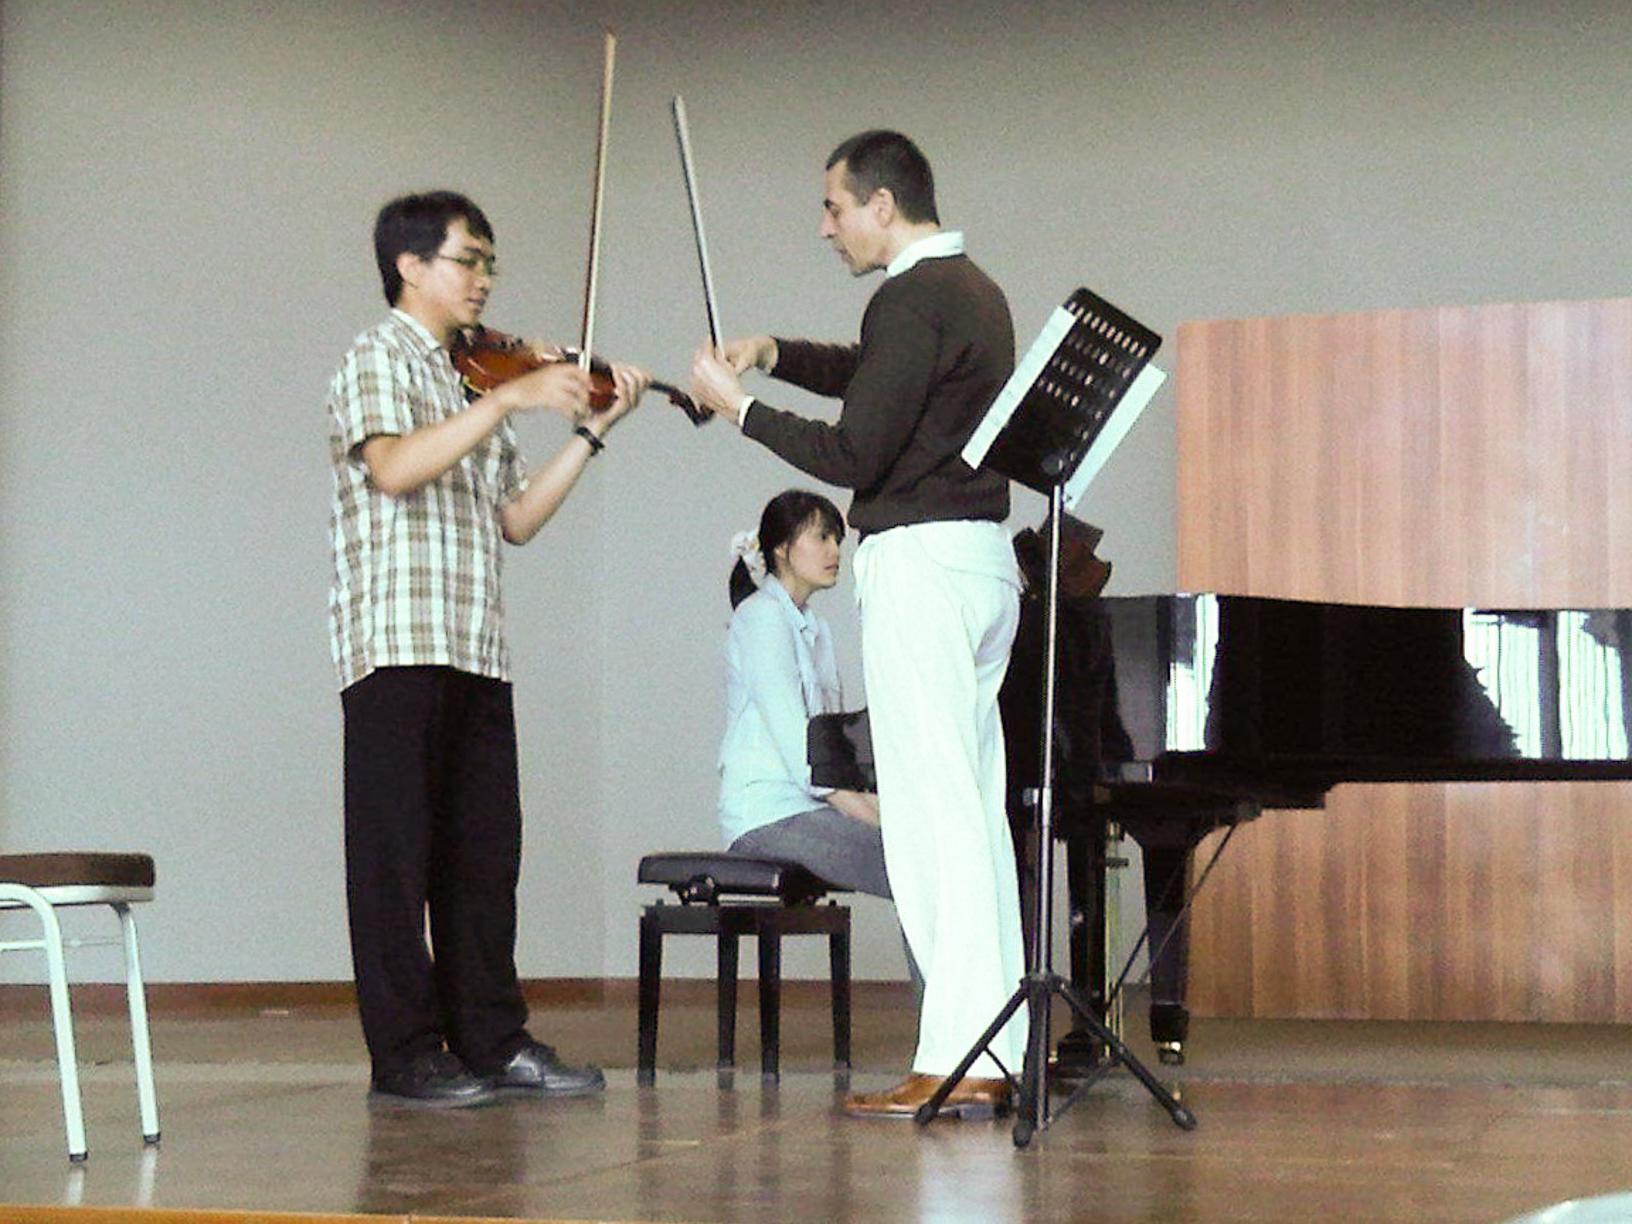 Masterclass in Indonesien, Gloriamus Music School in Jakarta, 2012